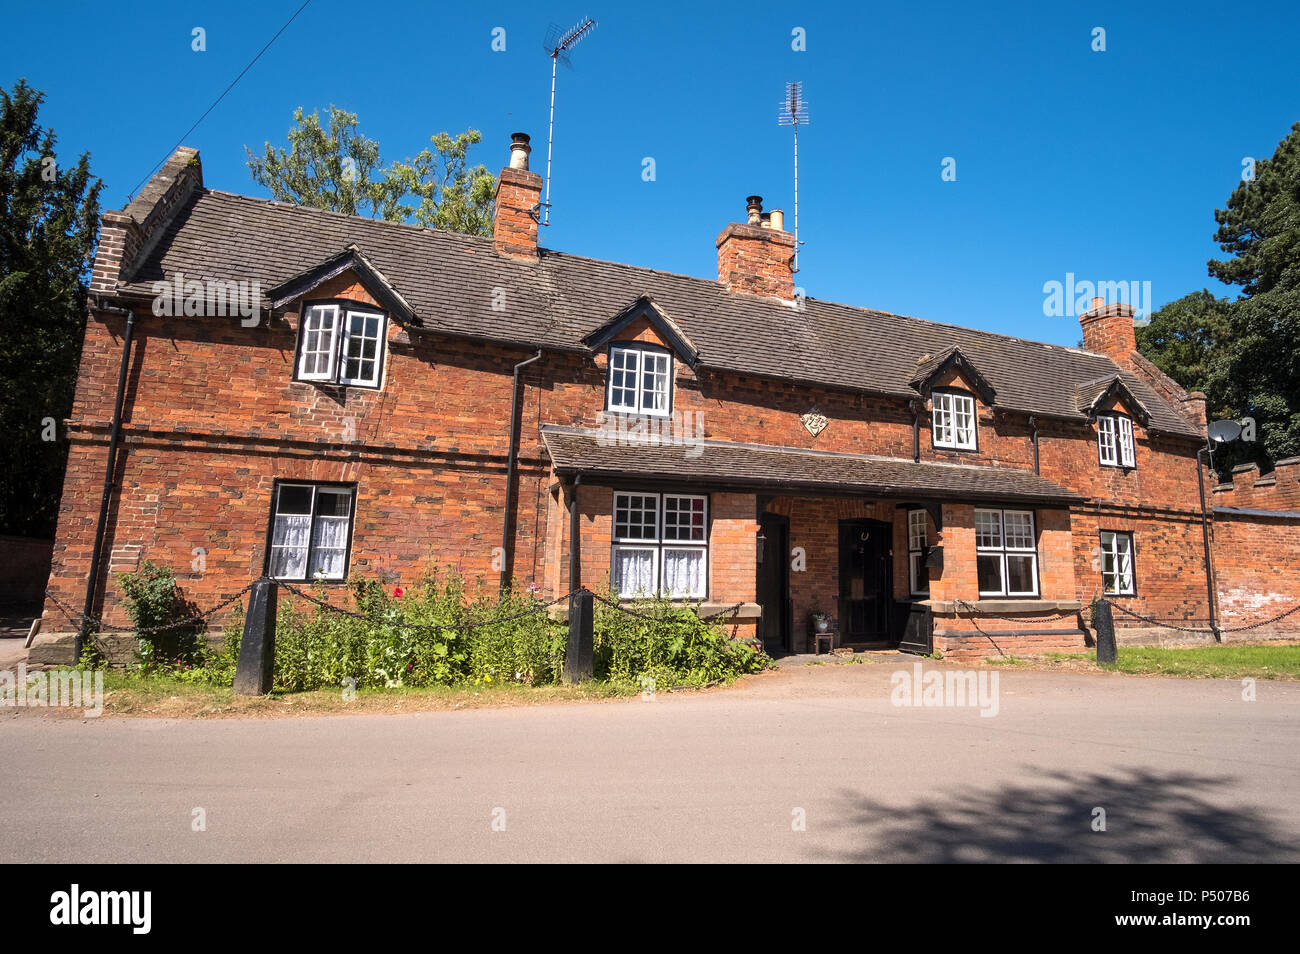 The village of Thrumpton, Nottinghamshire, UK - Stock Image